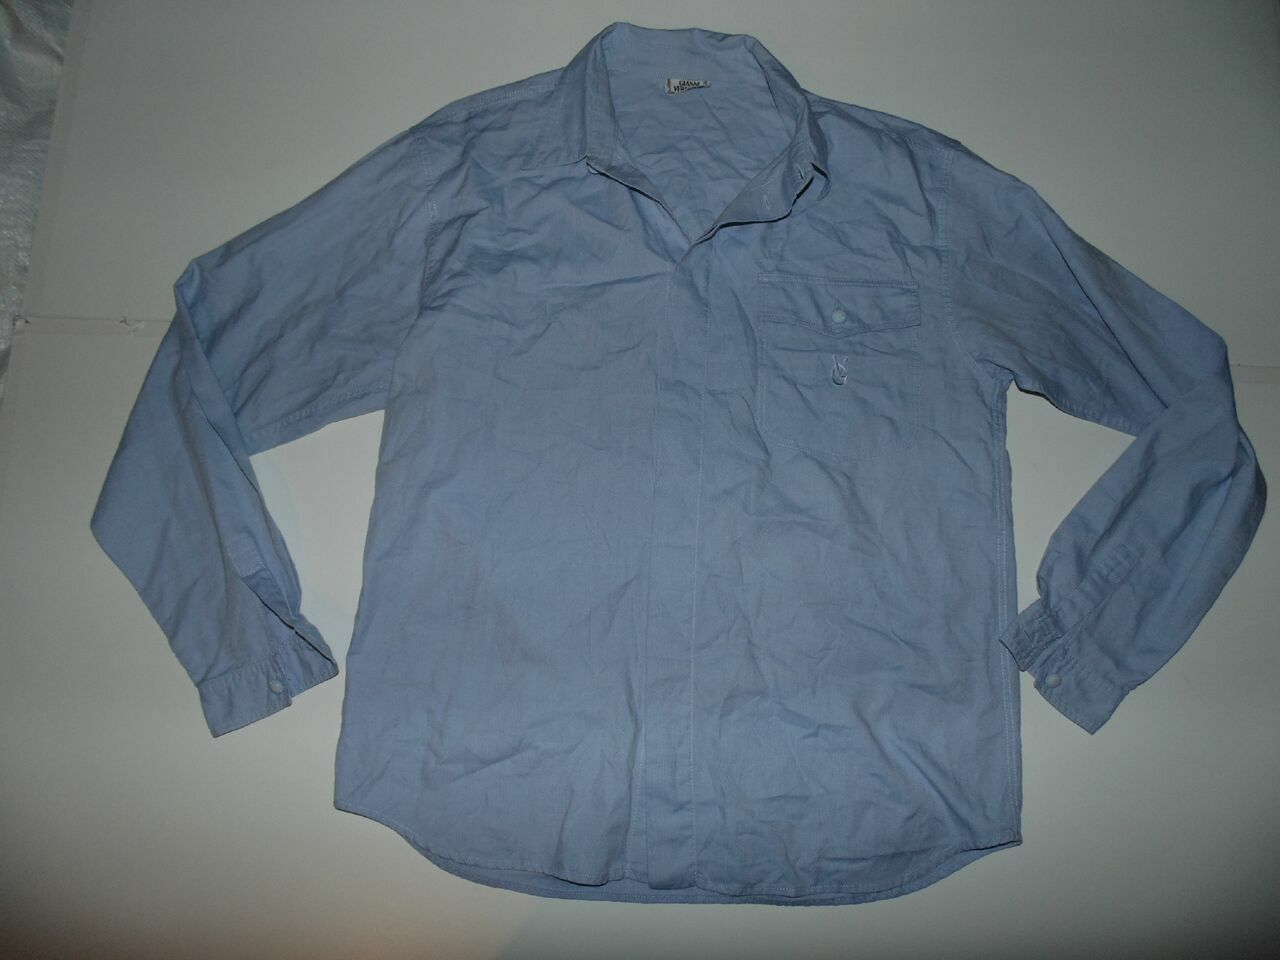 Gianni VERSACE Camicia Blu-Grande Da Uomo-S5771